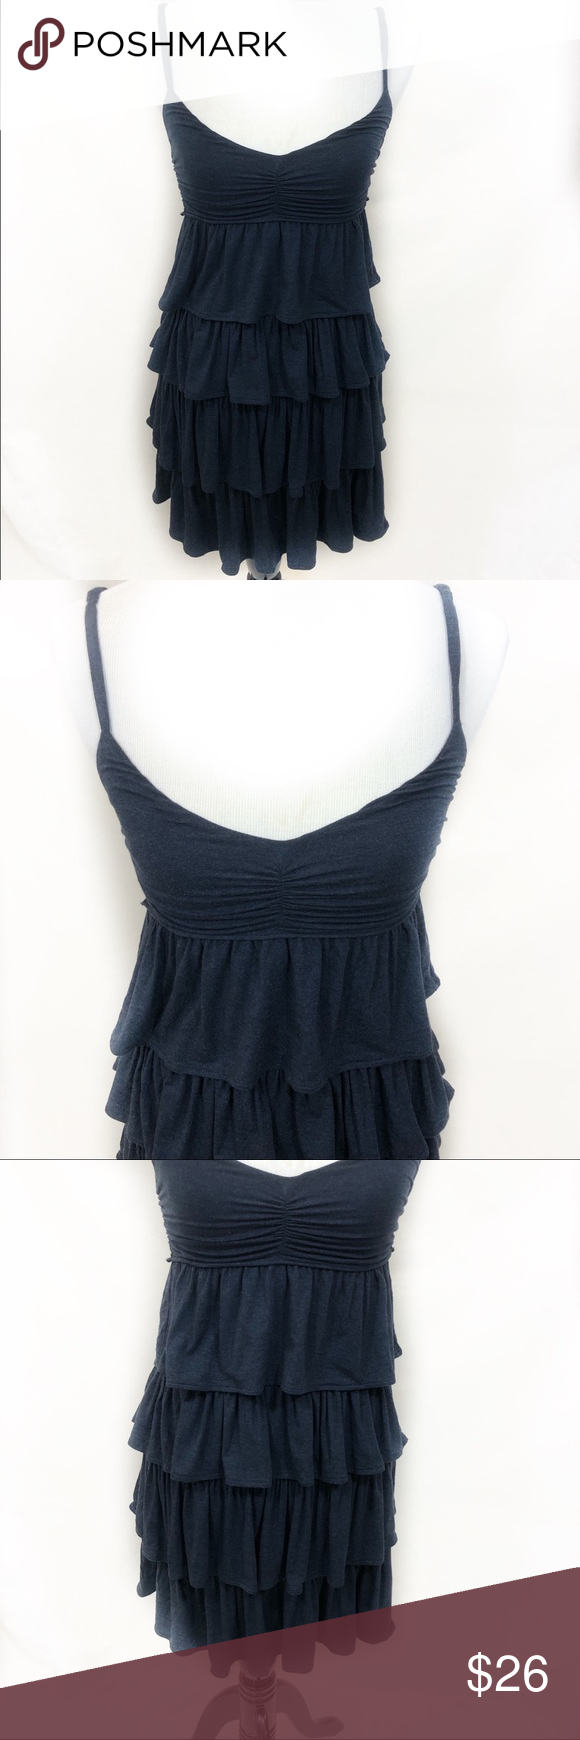 Blue ruffle dress from J Crew in size XS Blue ruffle